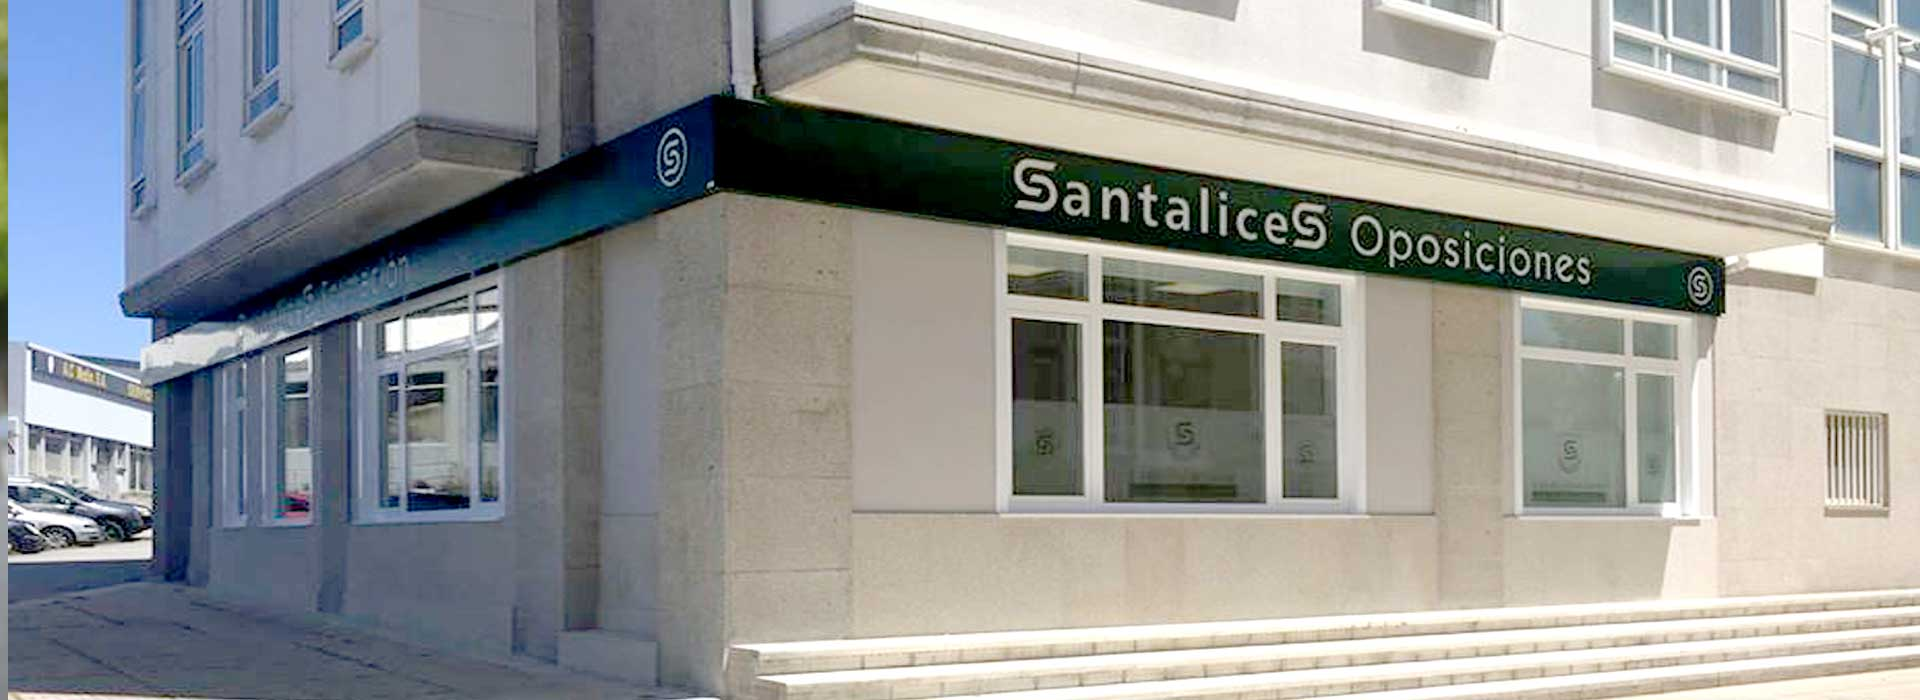 Academia Santalices Oposiciones Guardia Civil